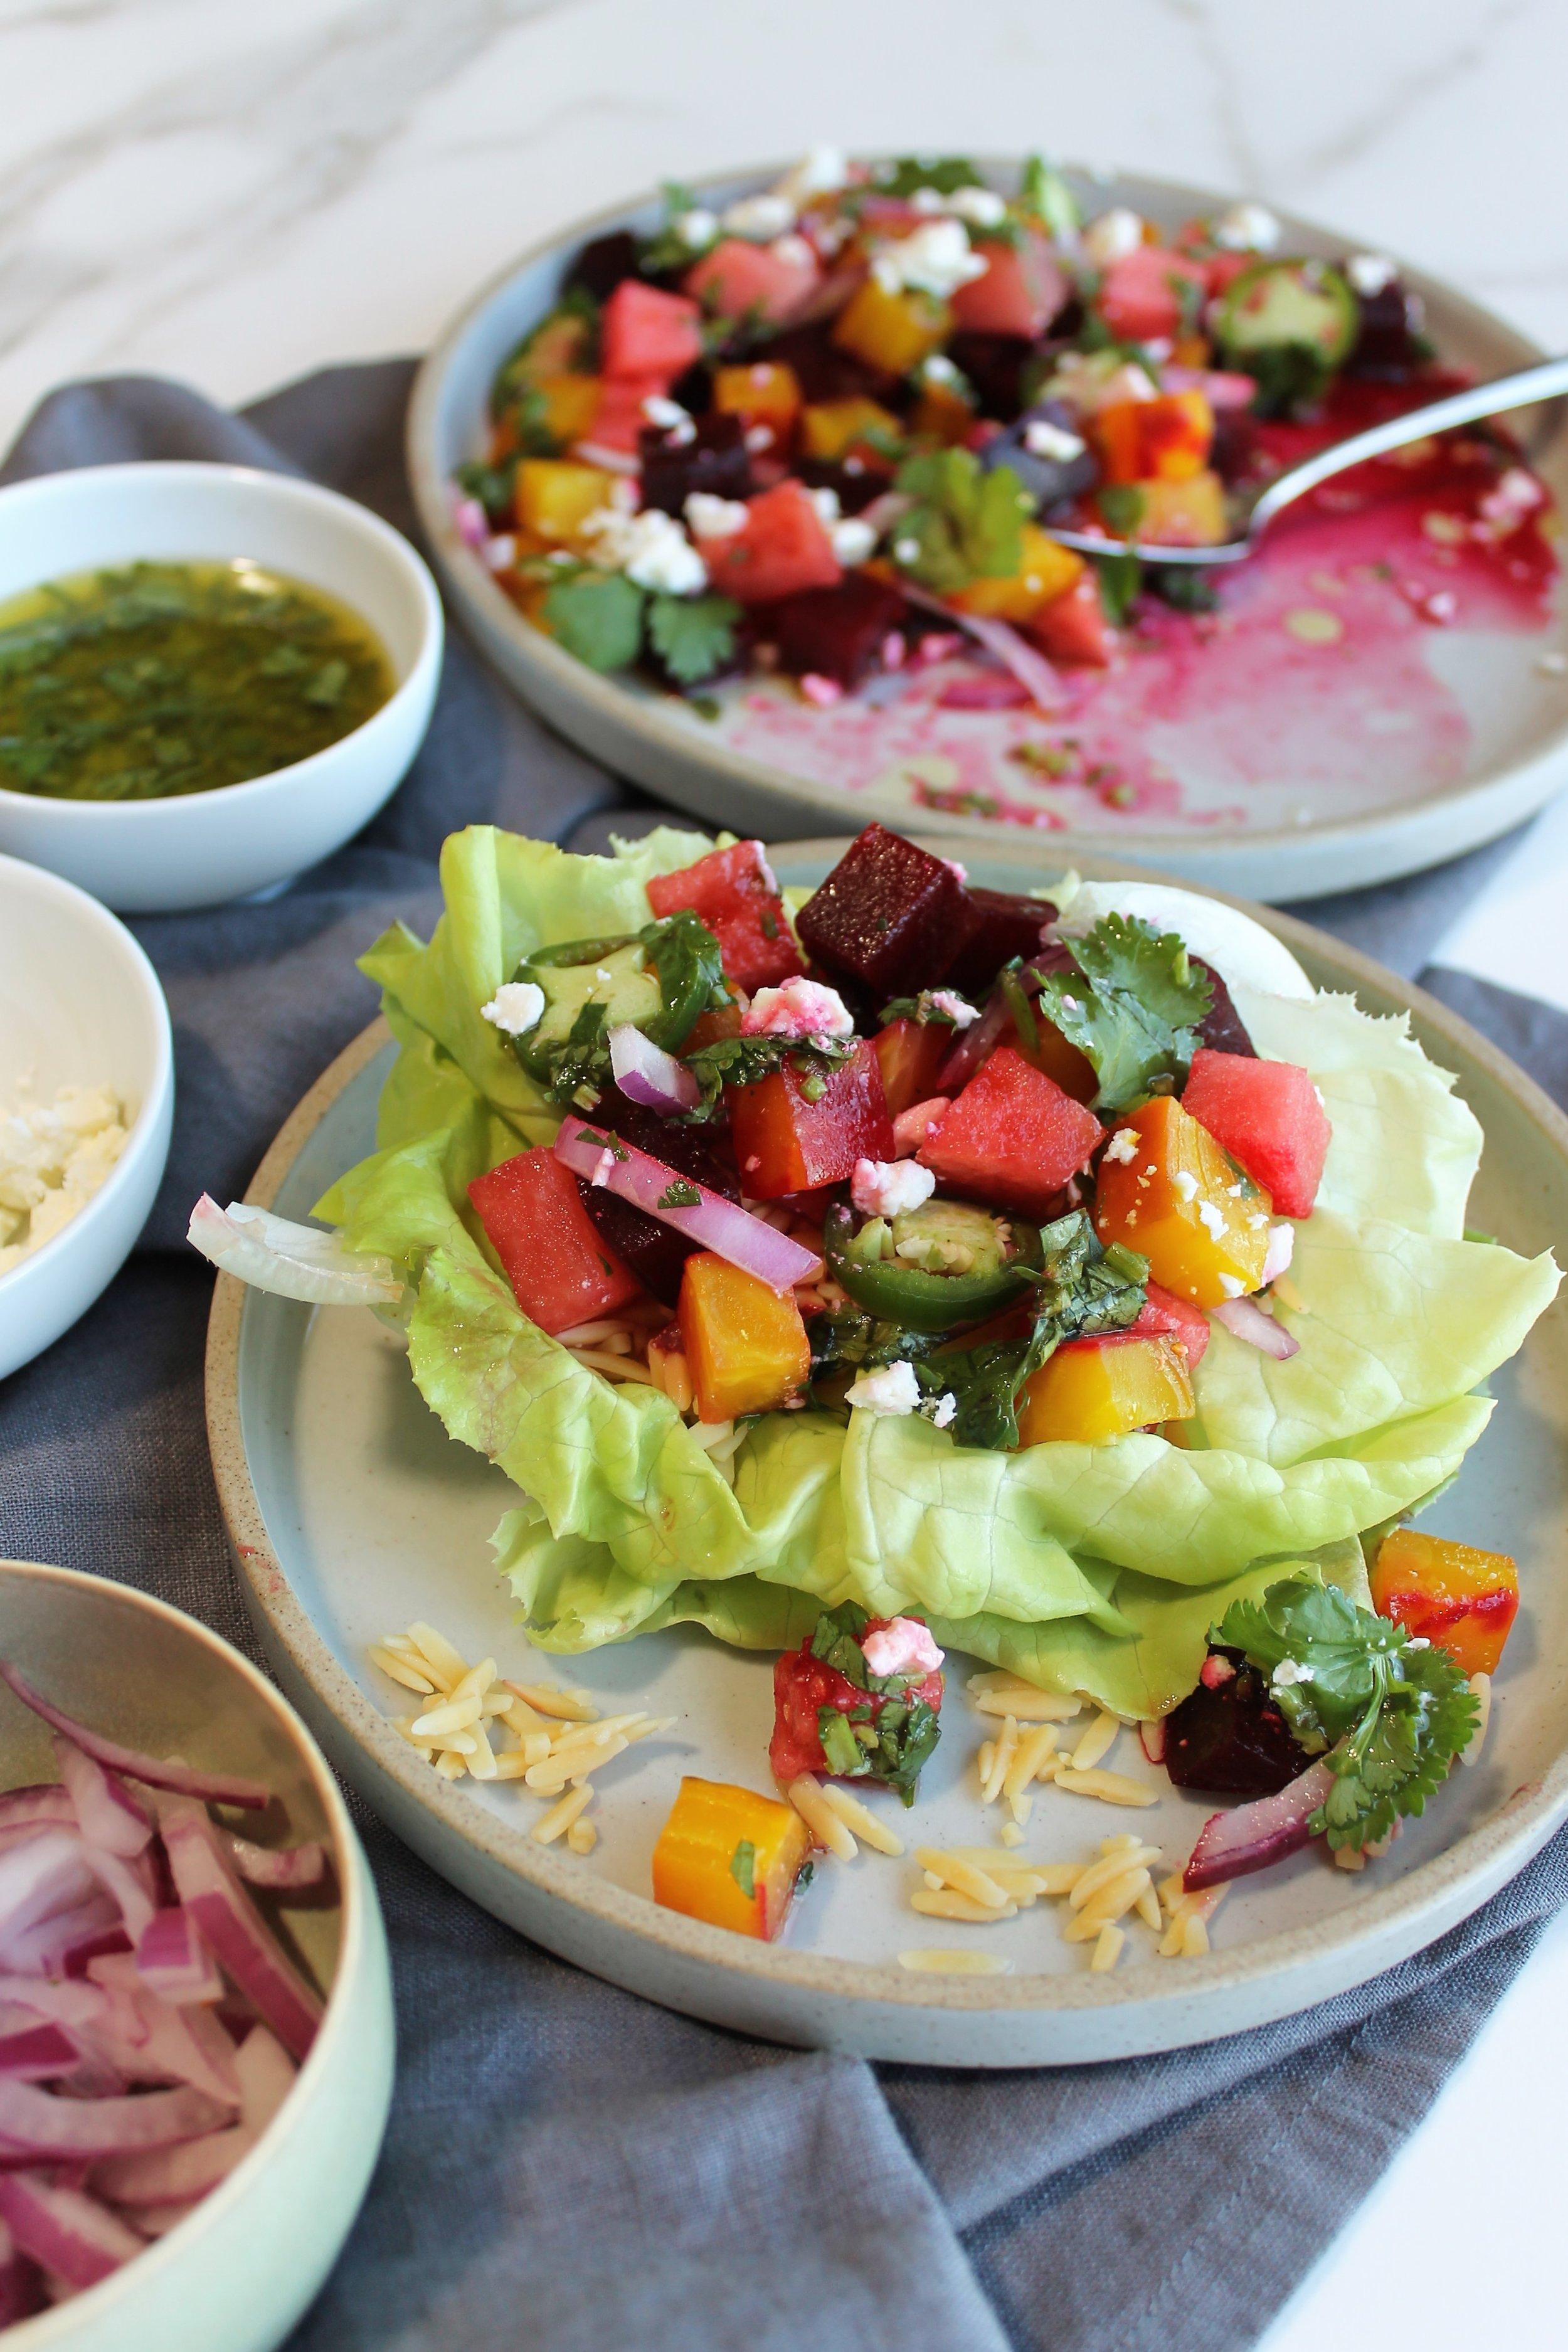 Lettuce_Cups_Watermelon_Beet_Salad.JPG